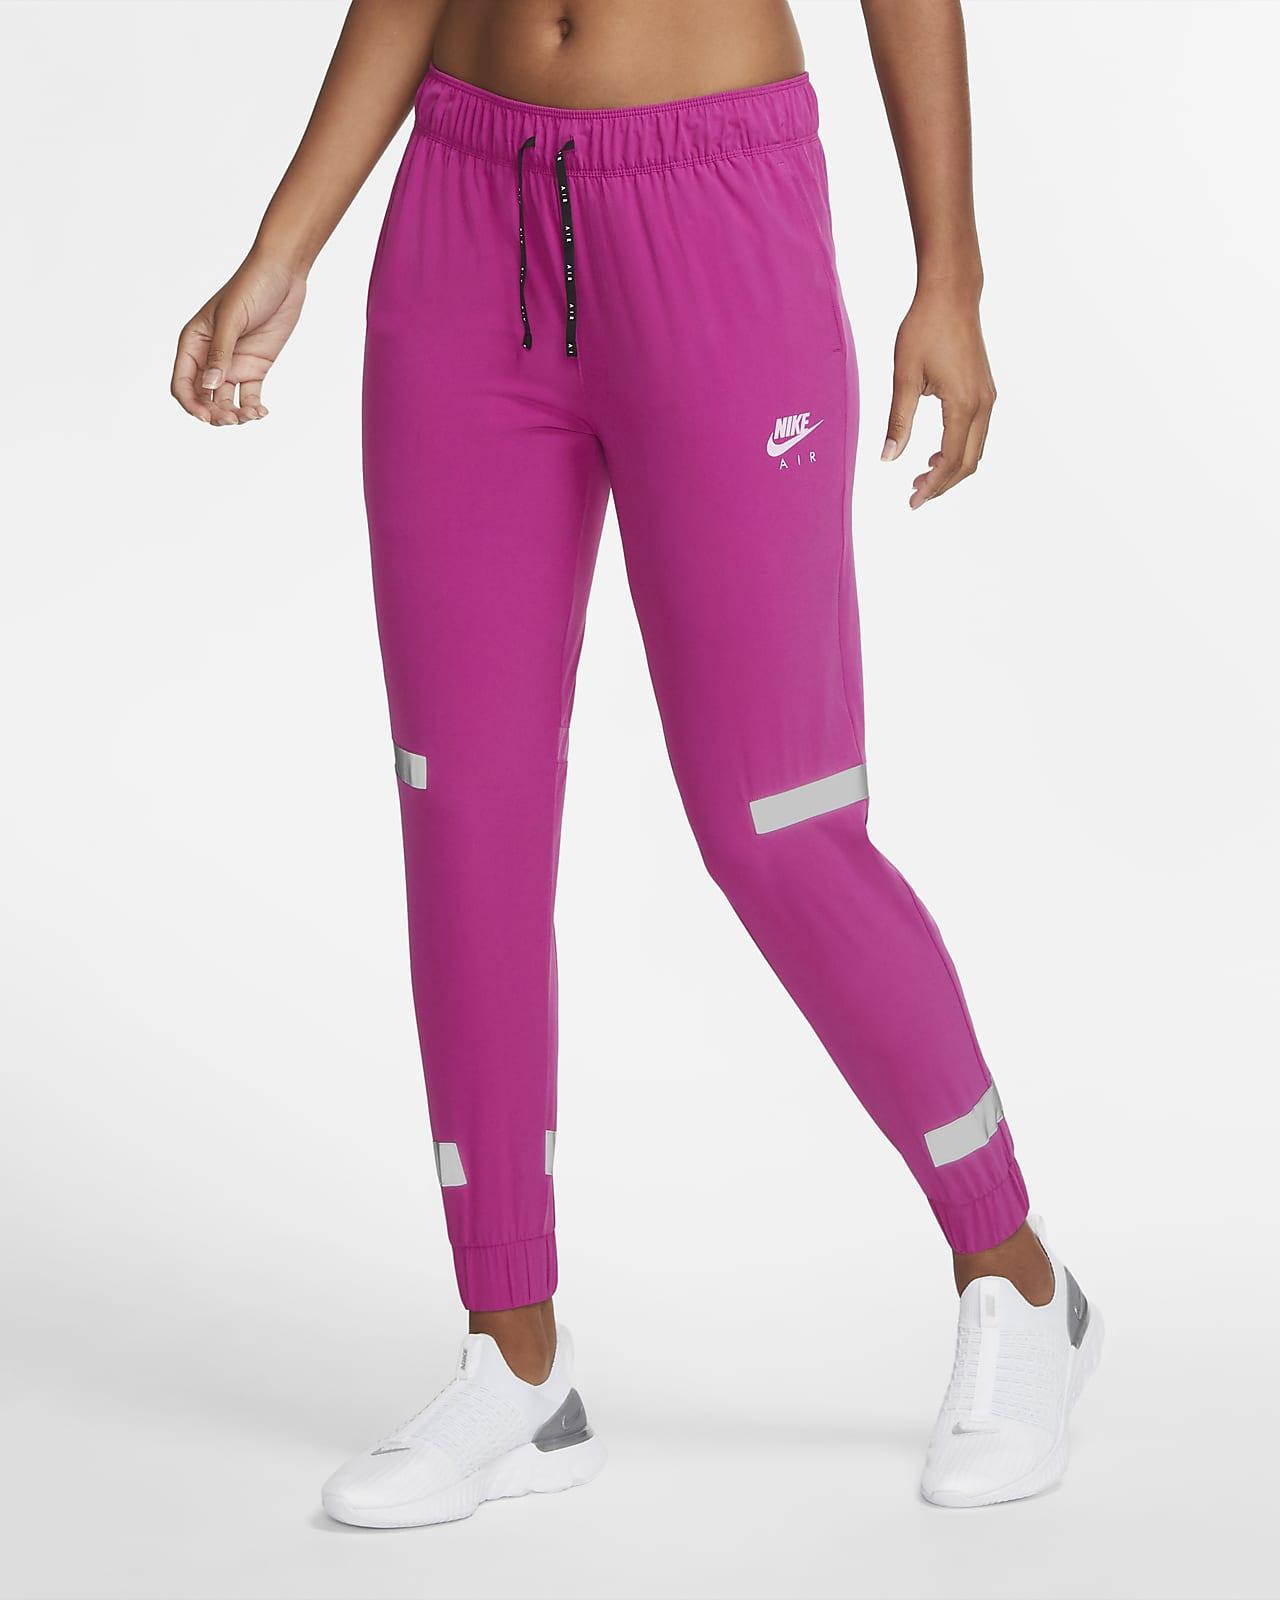 Nike Air Women's Running Trousers. Nike AE